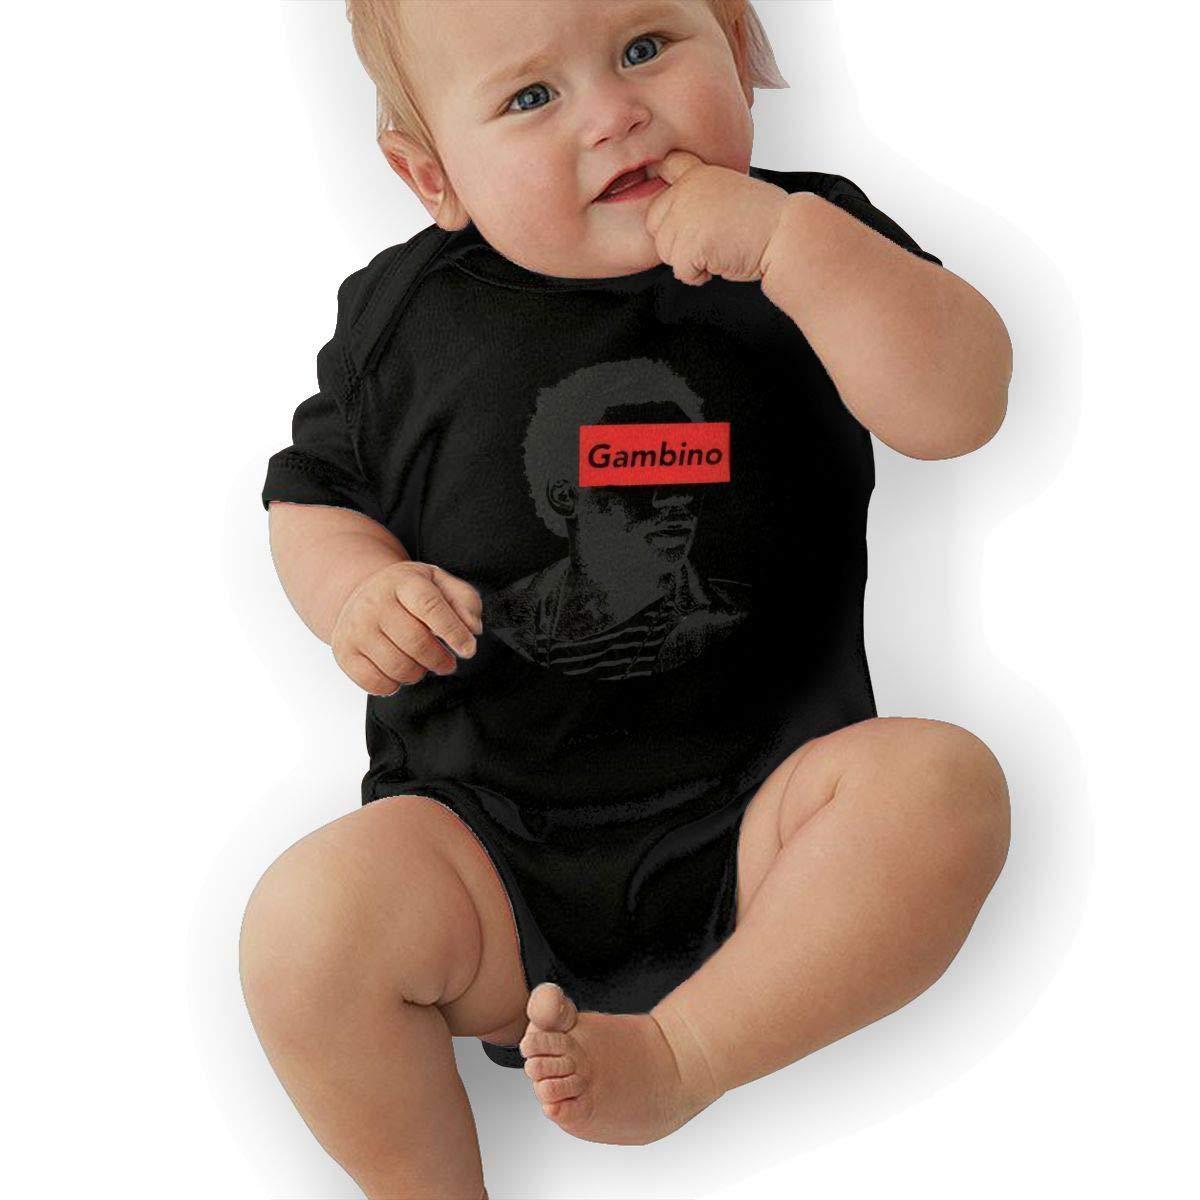 SHWPAKFA Kids Gambino Adorable Soft Music Band Jersey Creeping Suit,Black,6M